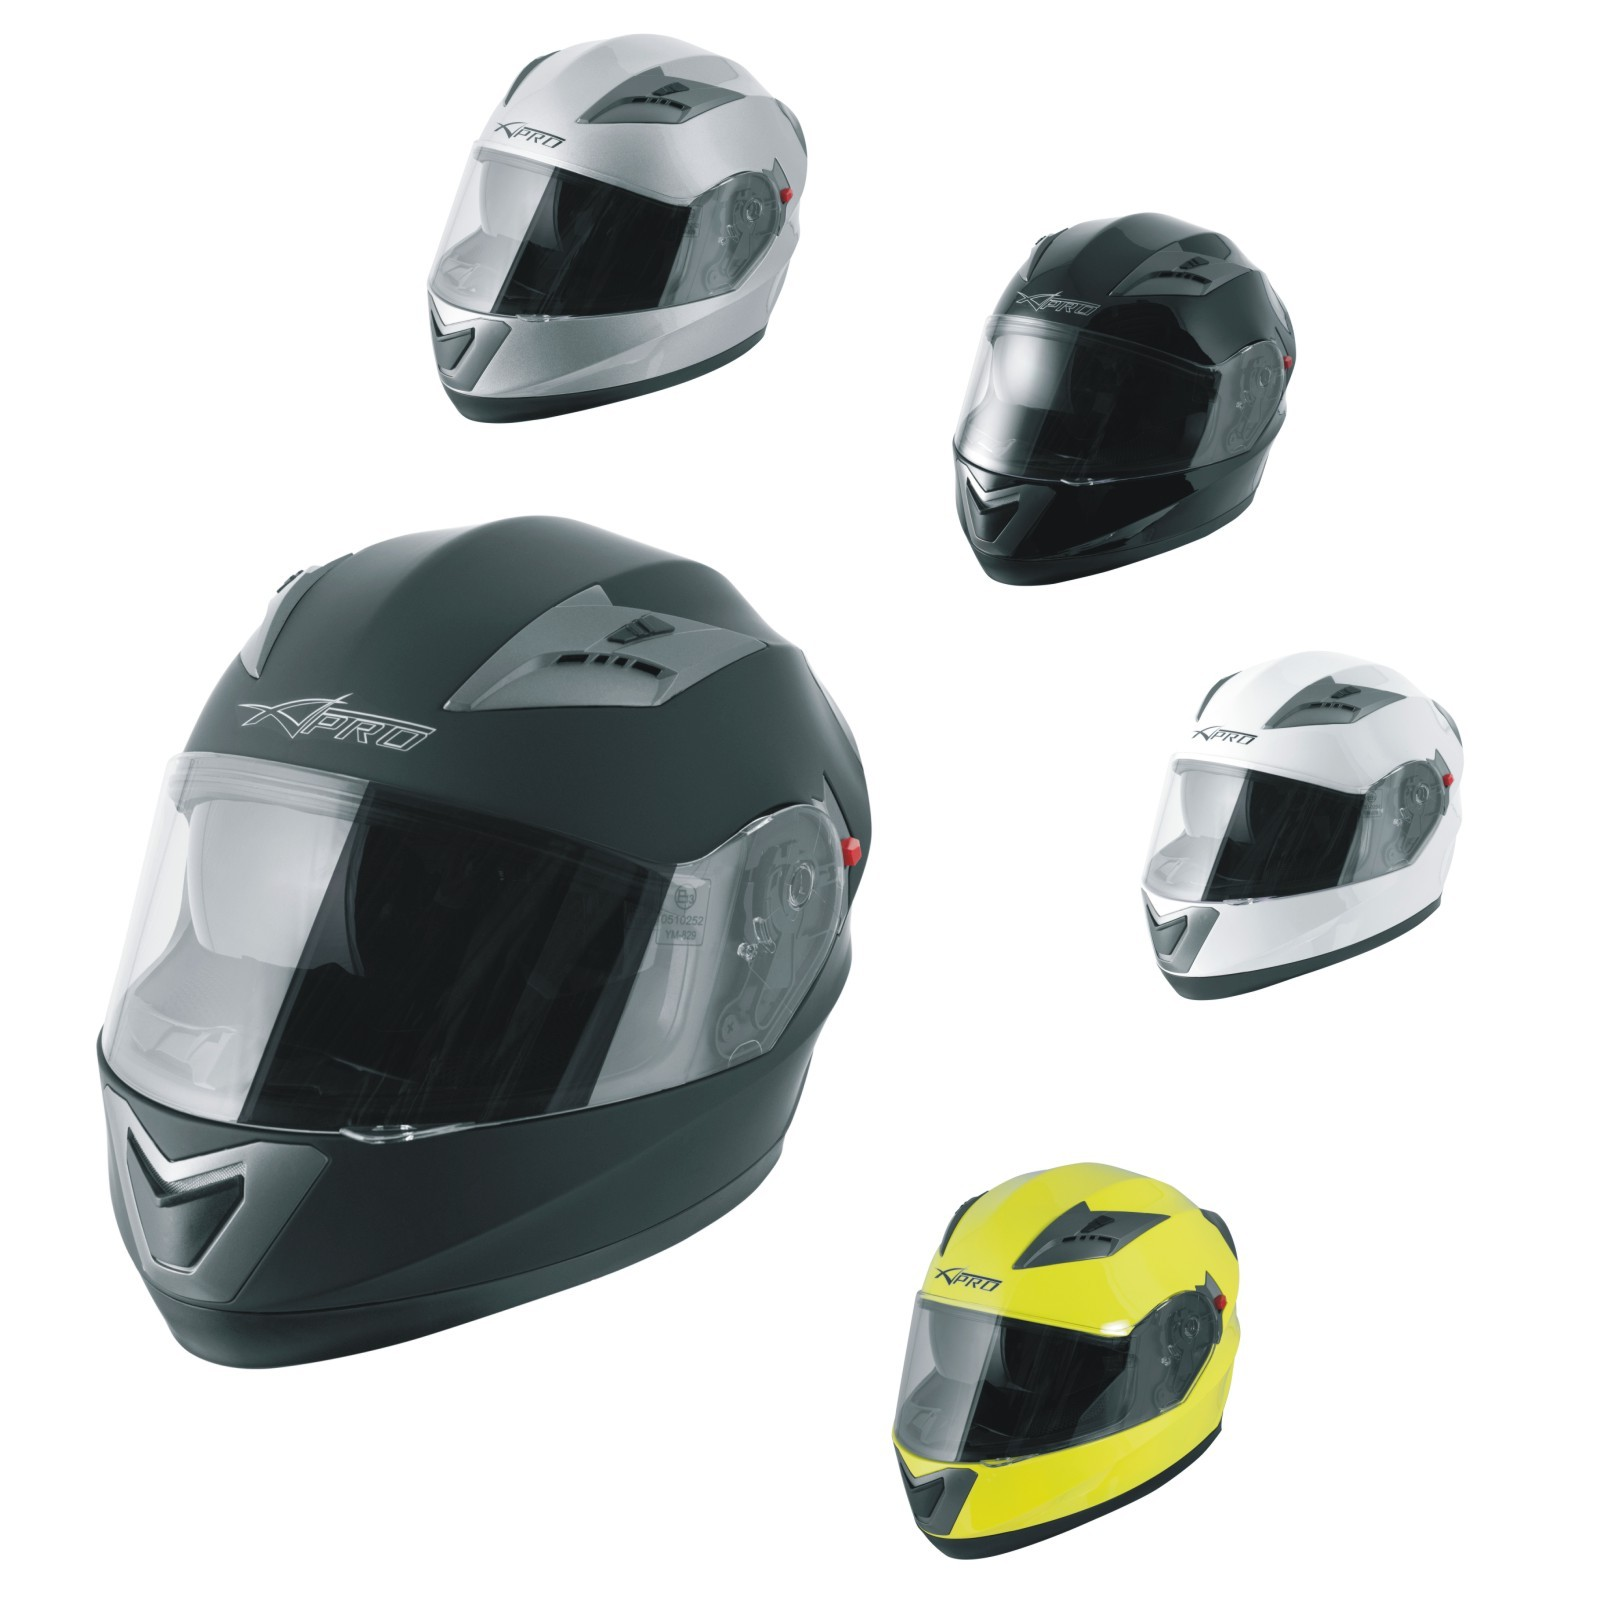 Casco Integrale Moto Scooter Visierino Parasole Touring